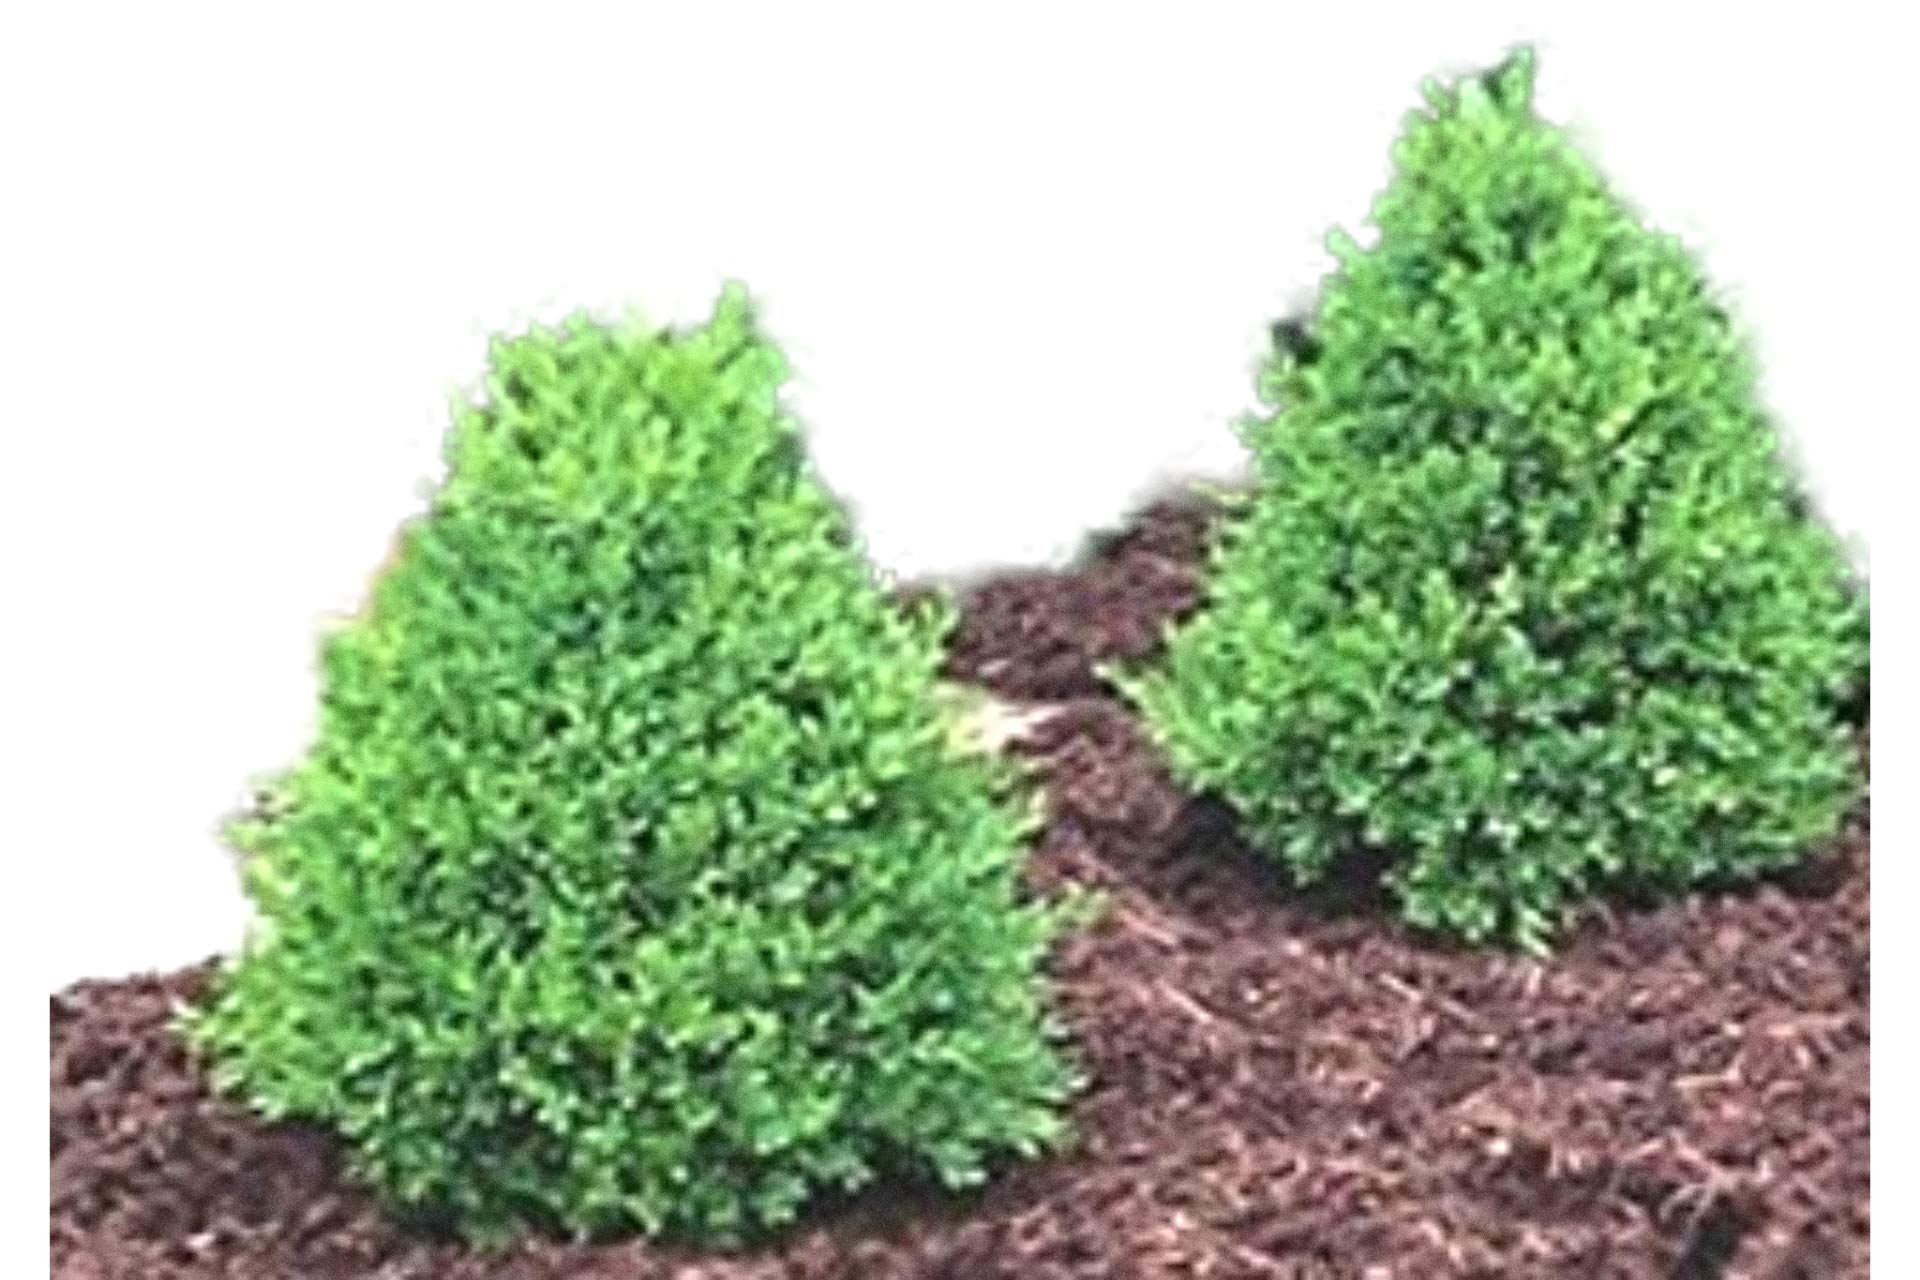 Green Mountain Boxwood - Quantity 10 Live Plants in Quart Pots by DAS Farms (No California) by DAS Farms (Image #1)